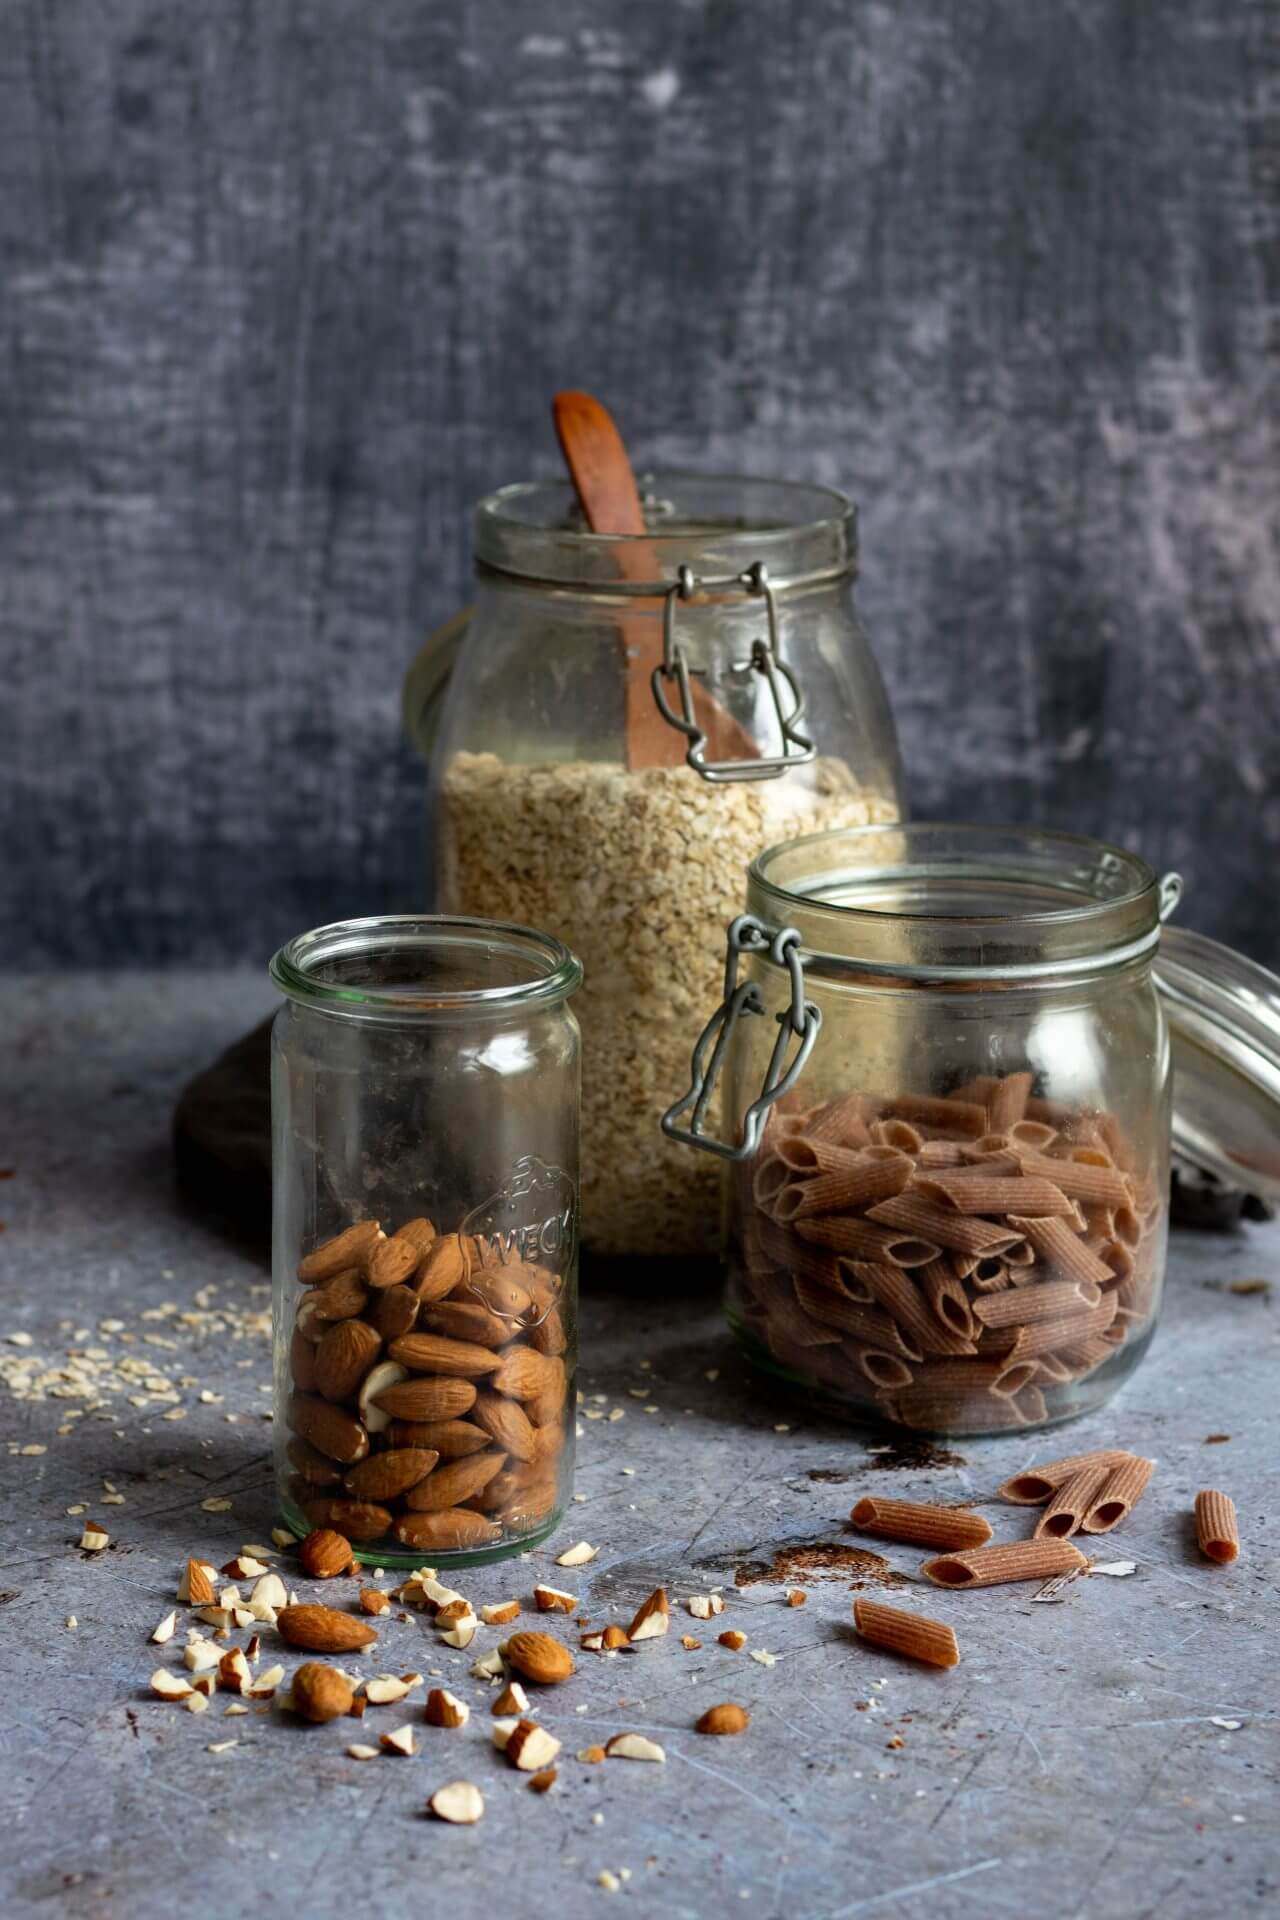 glutenvrij-ontbijt-recept